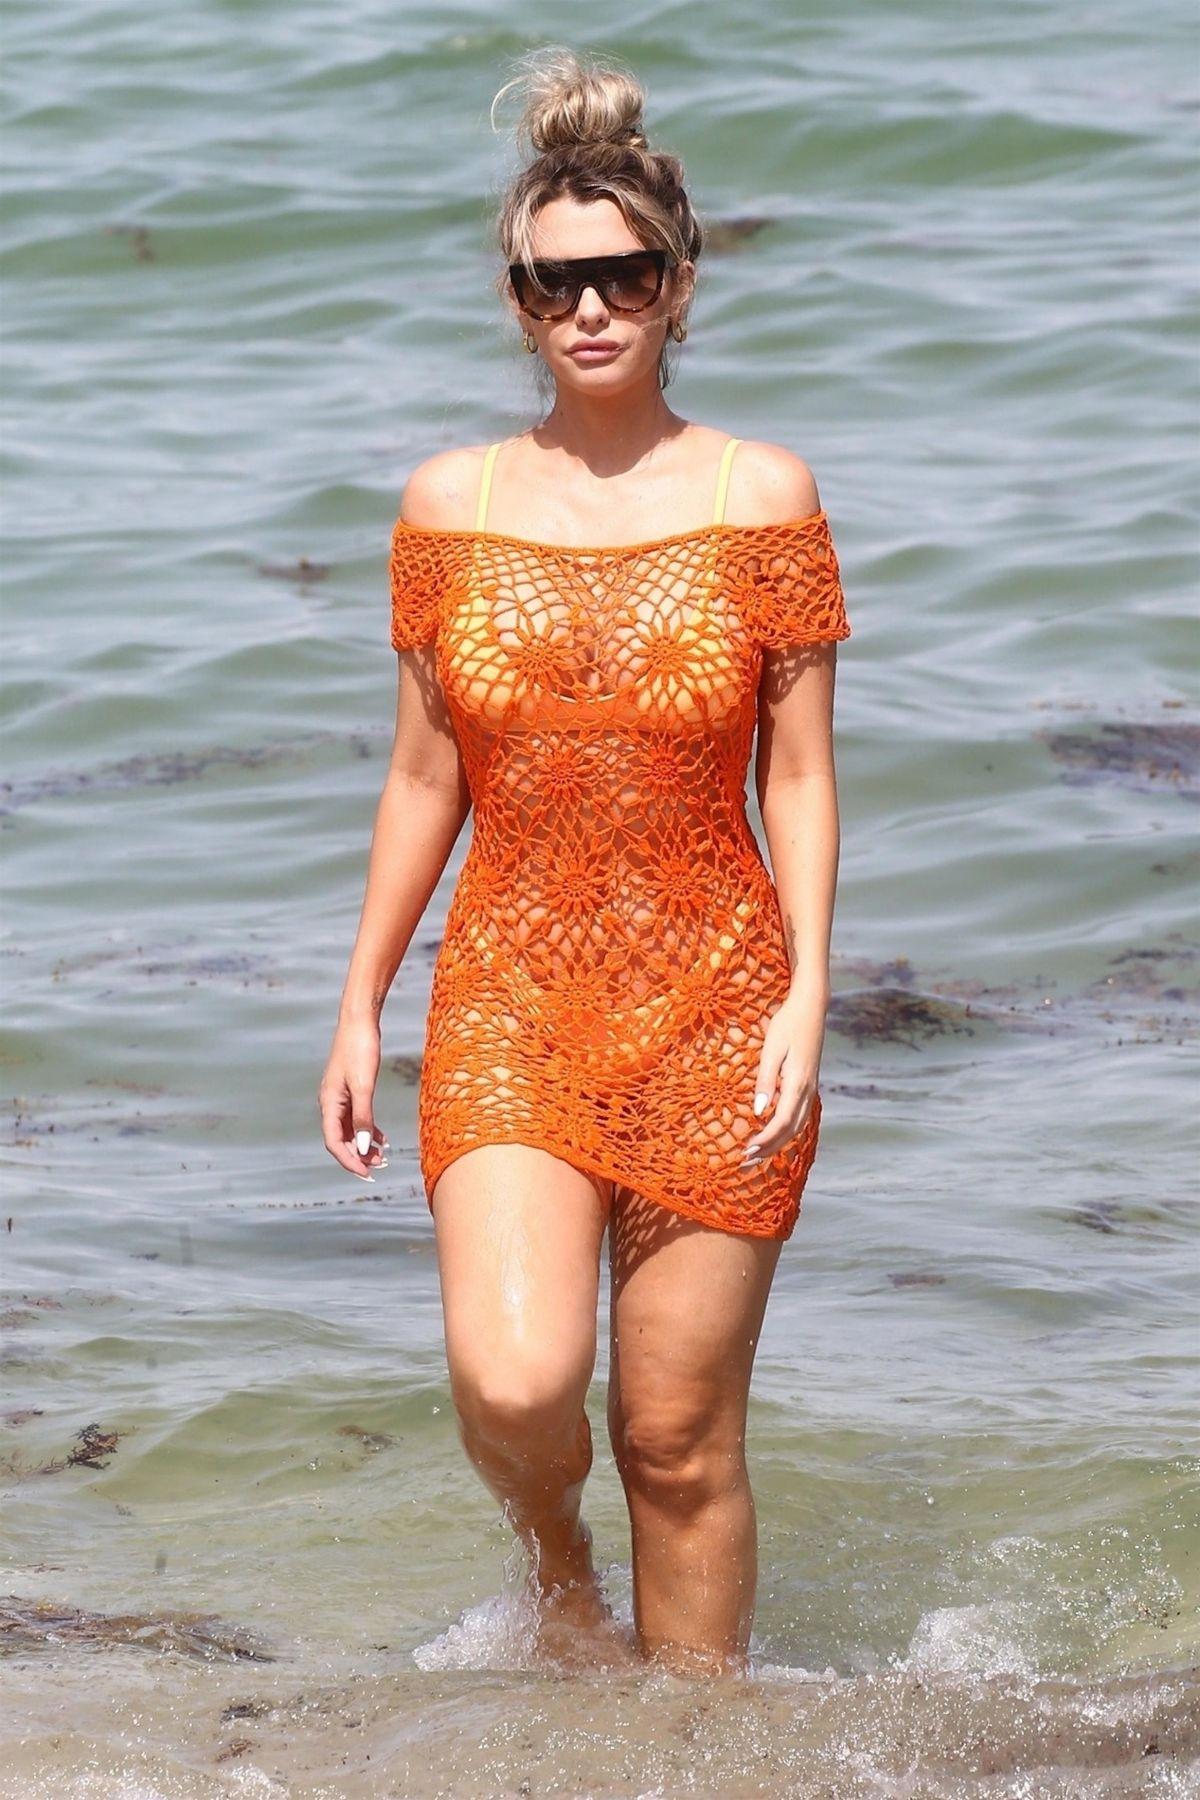 Emily sears bikini nudes (84 photo)